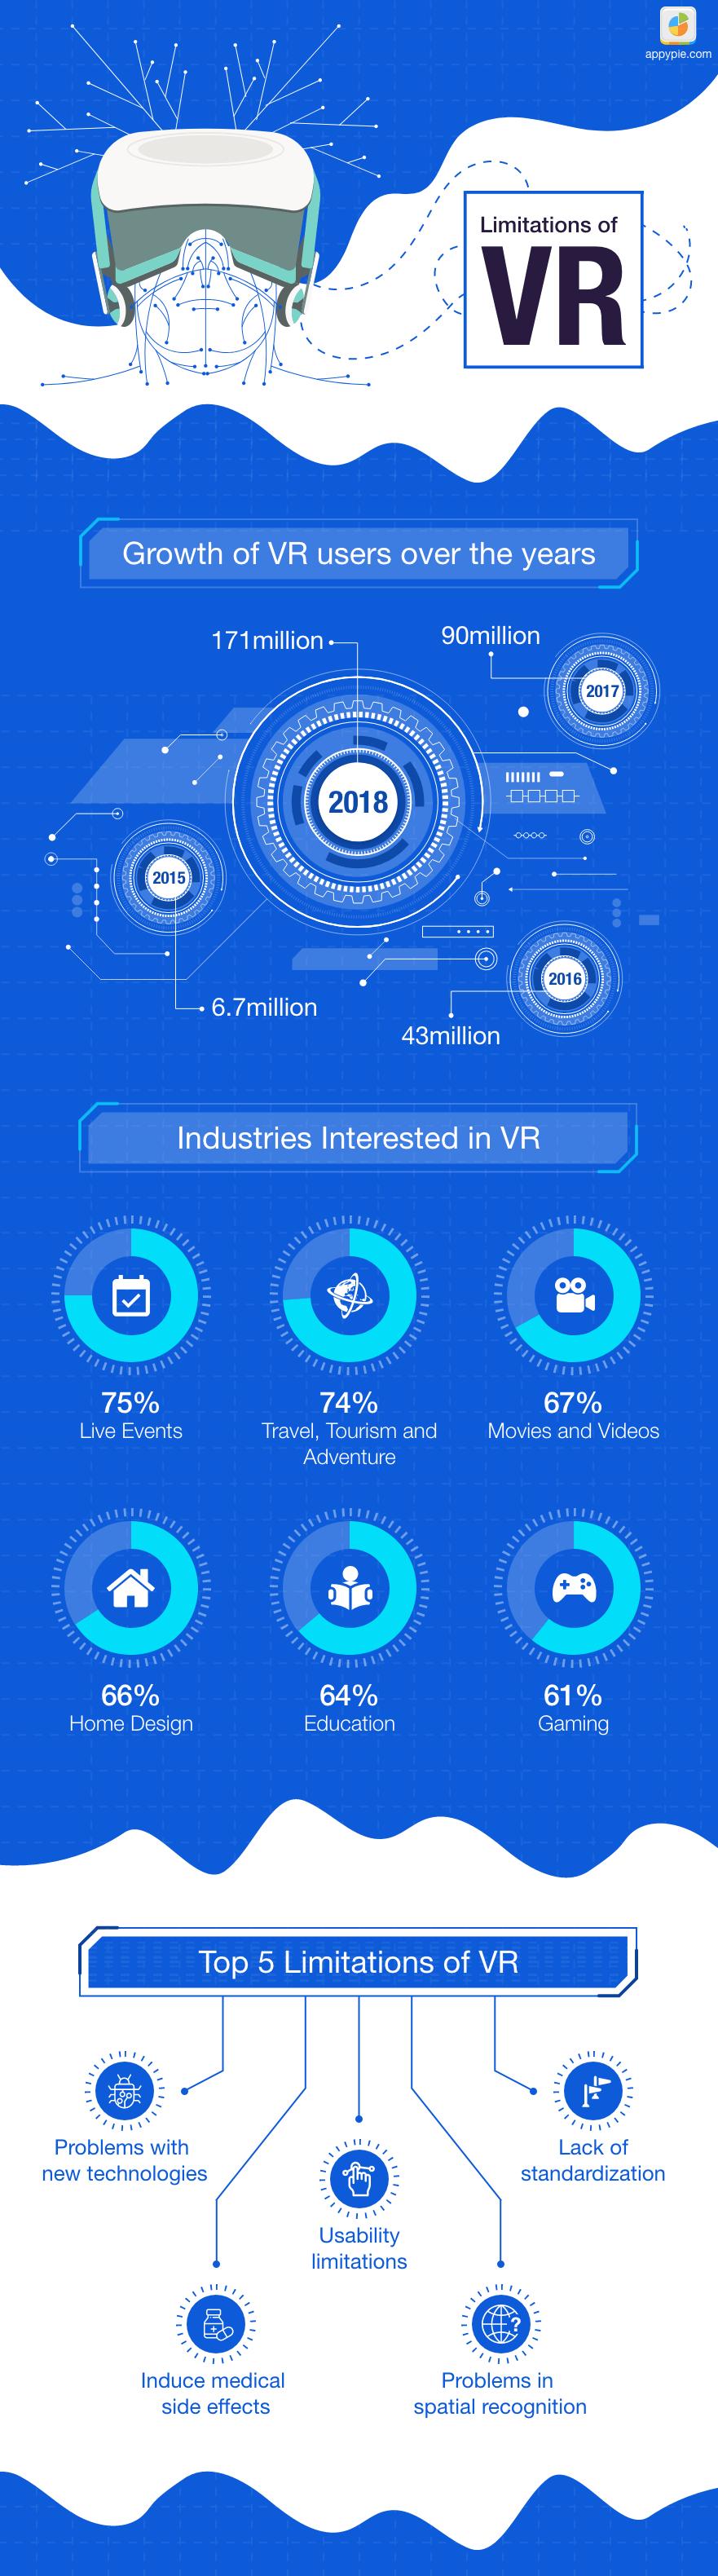 The Limitations of Virtual Reality